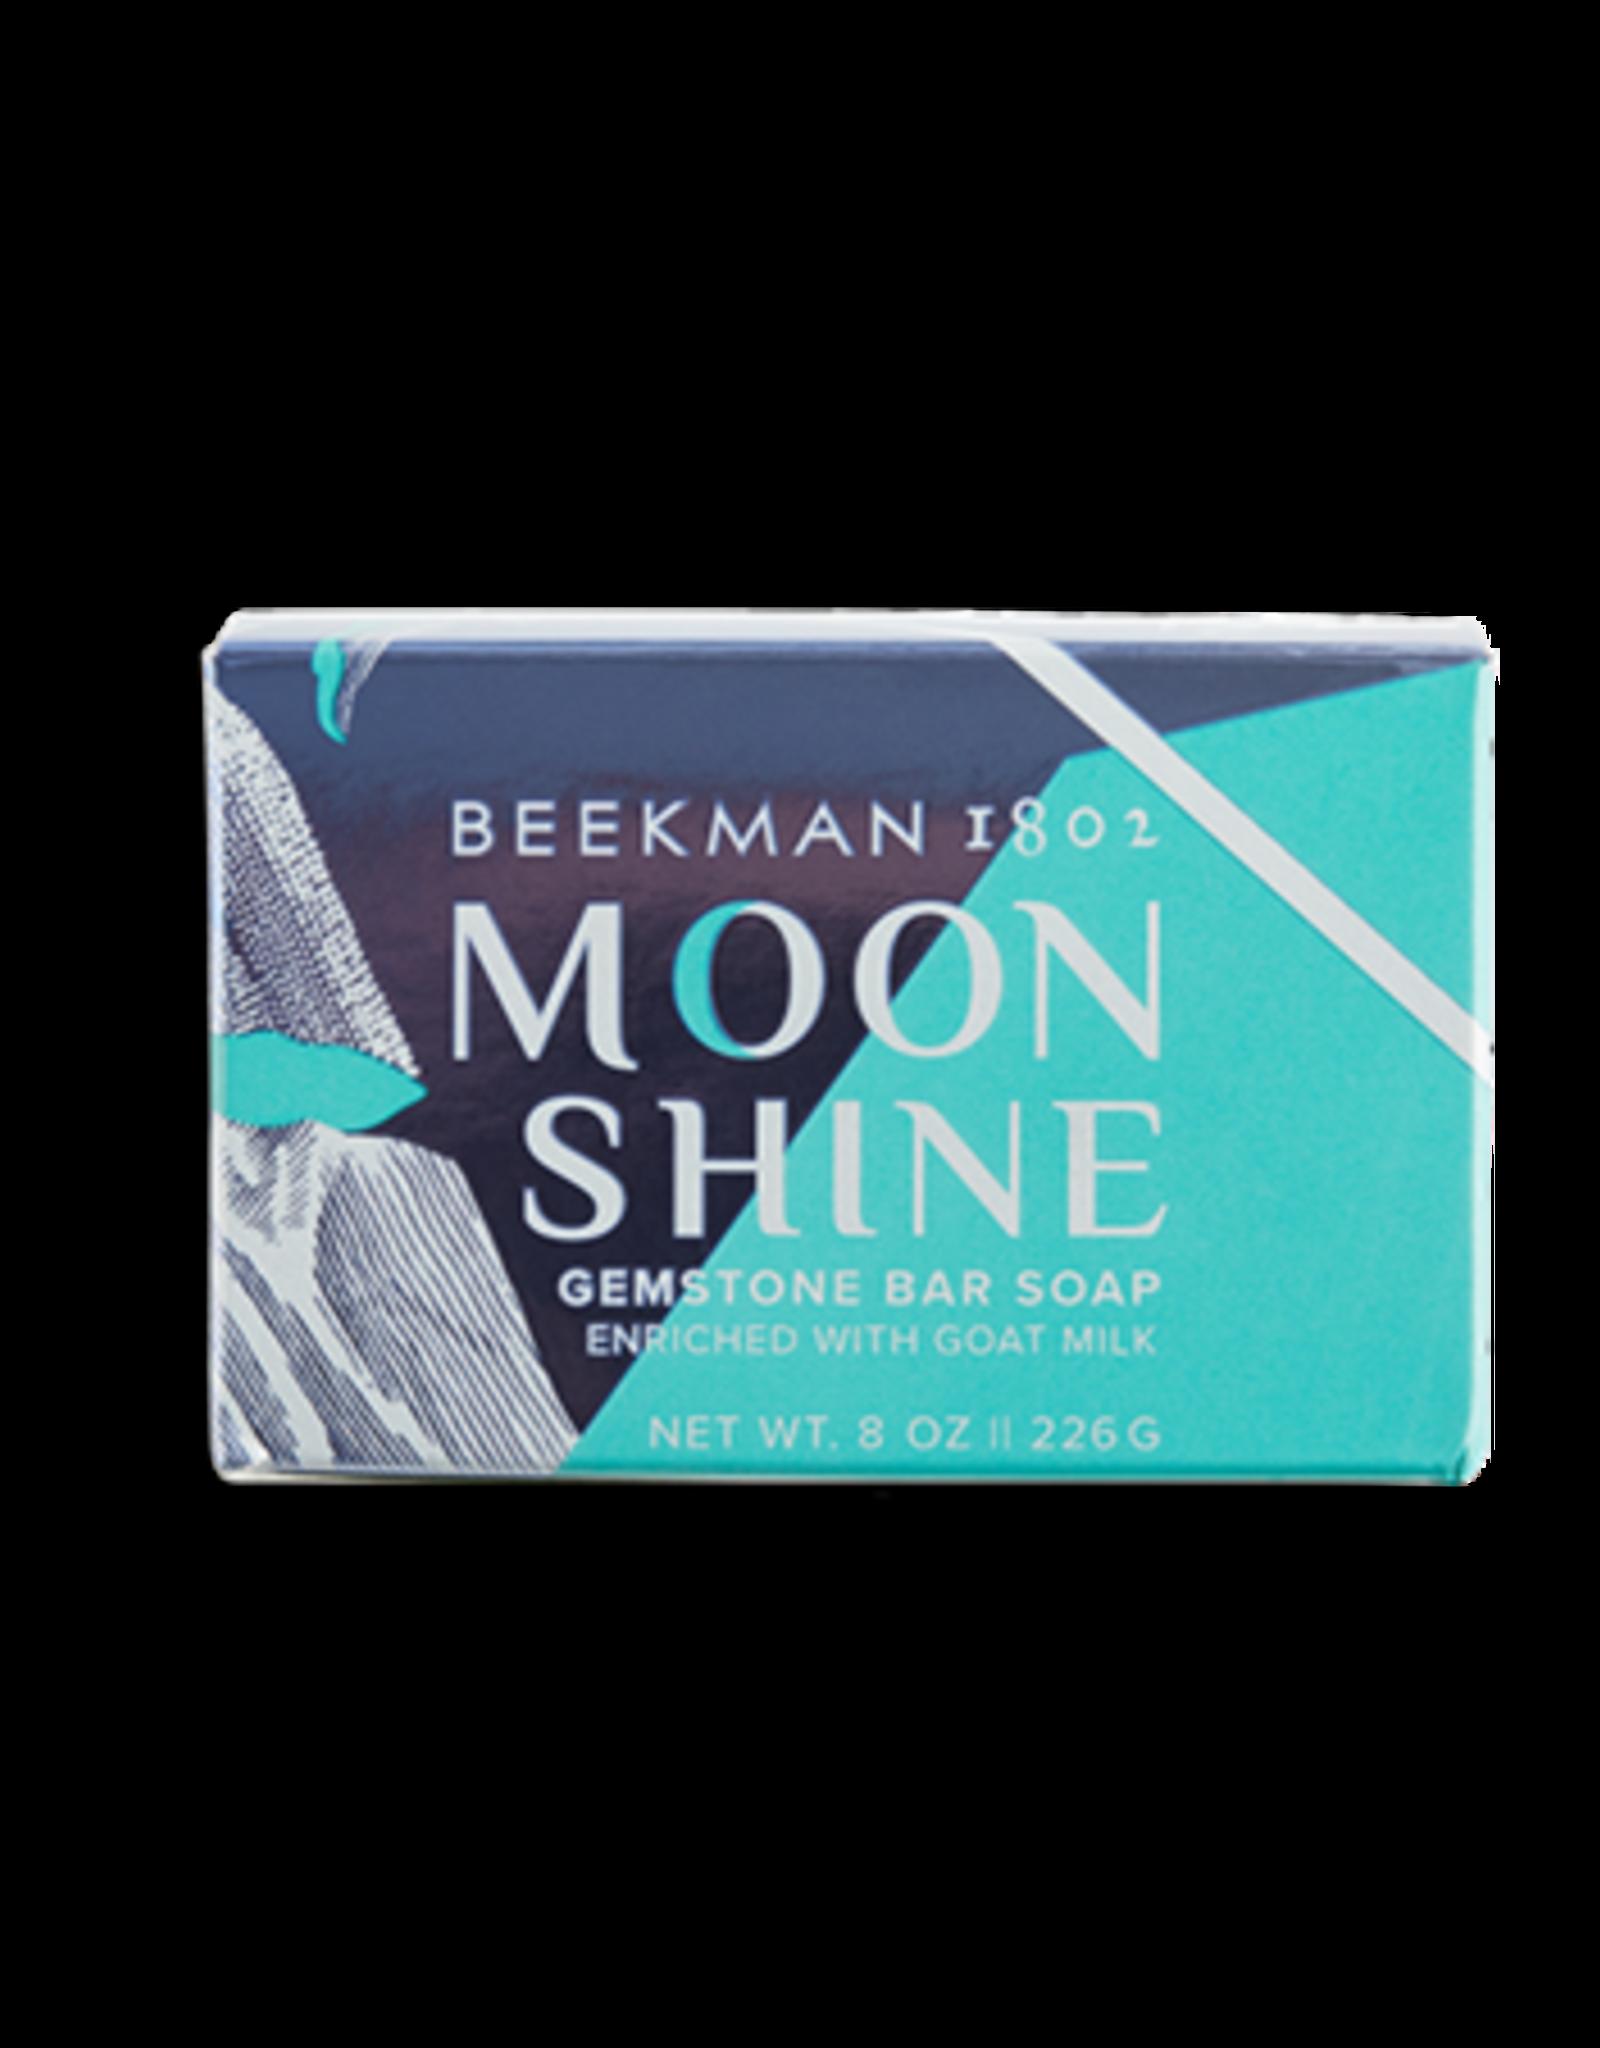 Beekman 1802 Moonshine Bar Soap